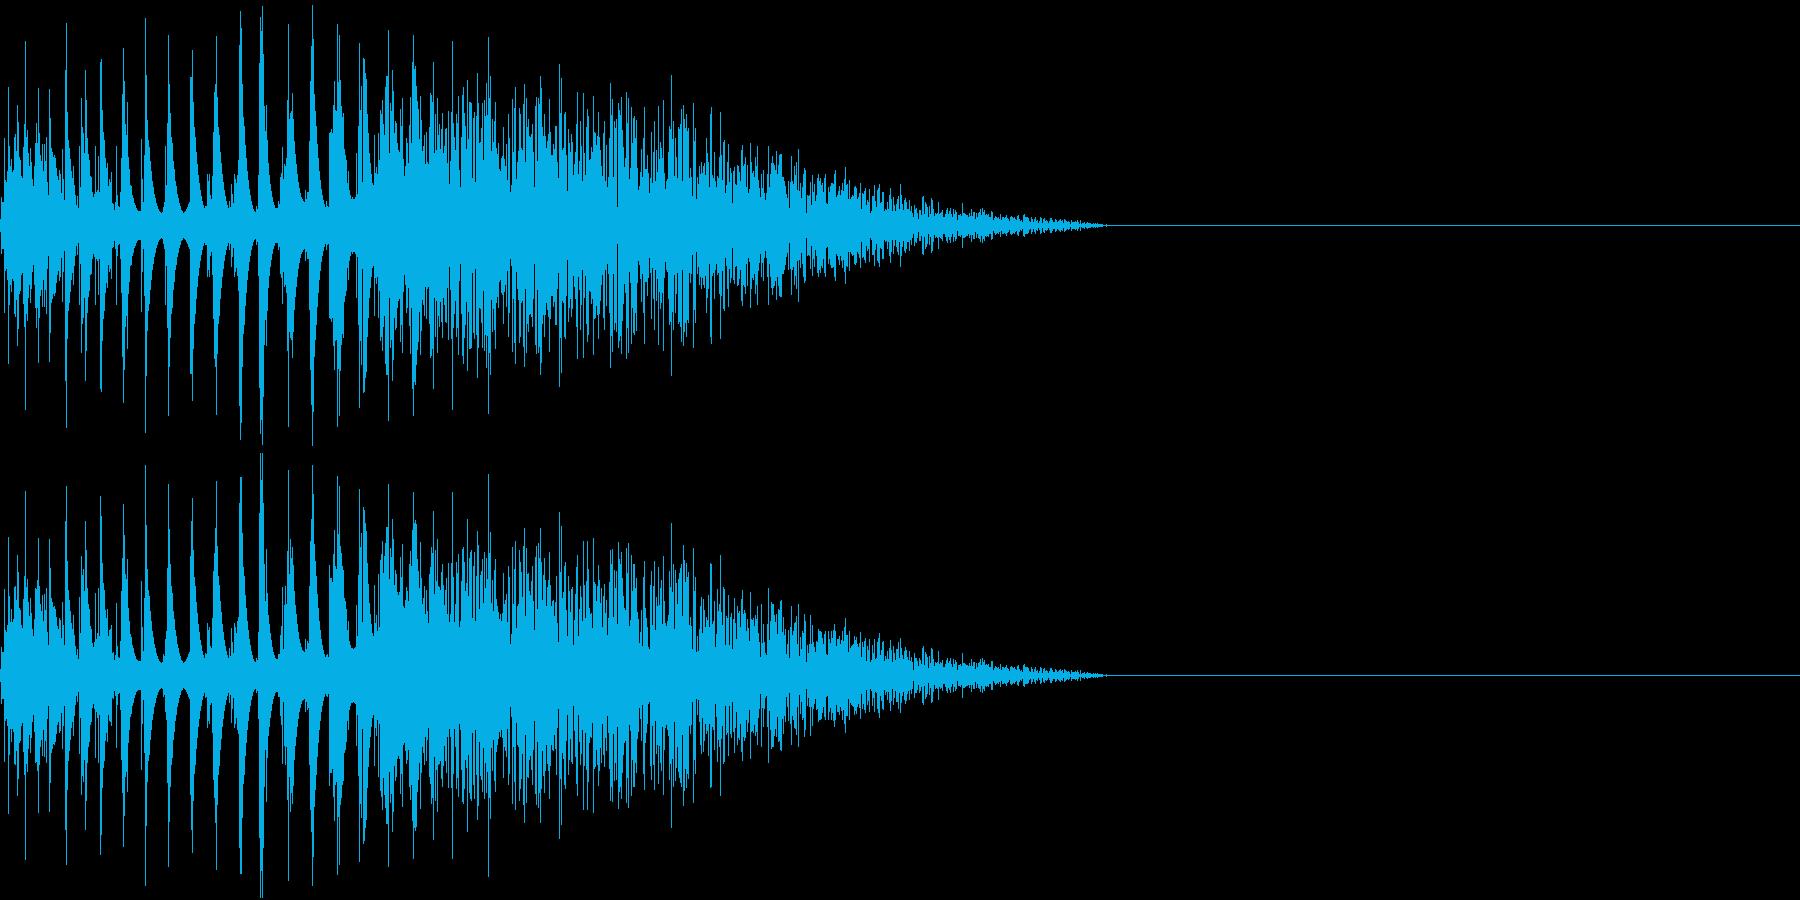 DTM Snare 1 オリジナル音源の再生済みの波形